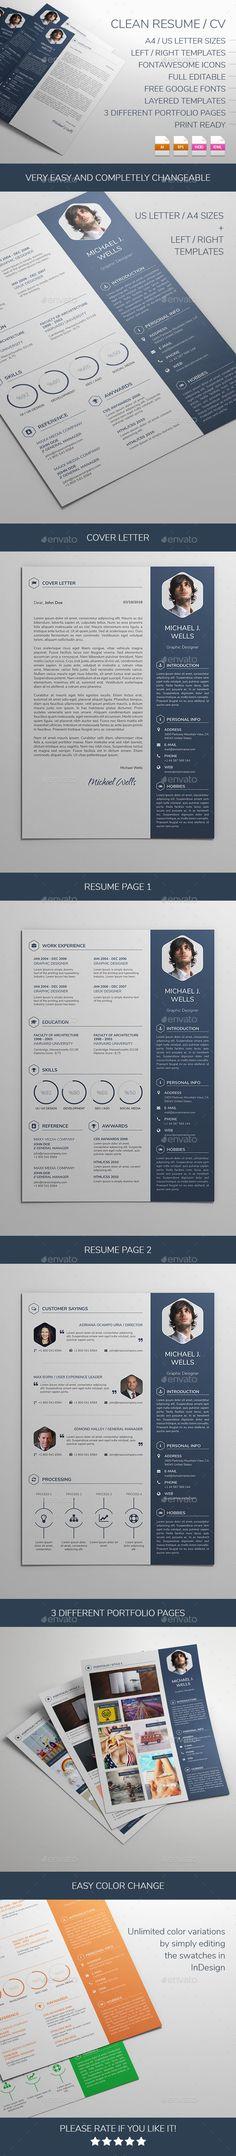 Clean Resume/CV Bundle Creative, Template and Resume cv